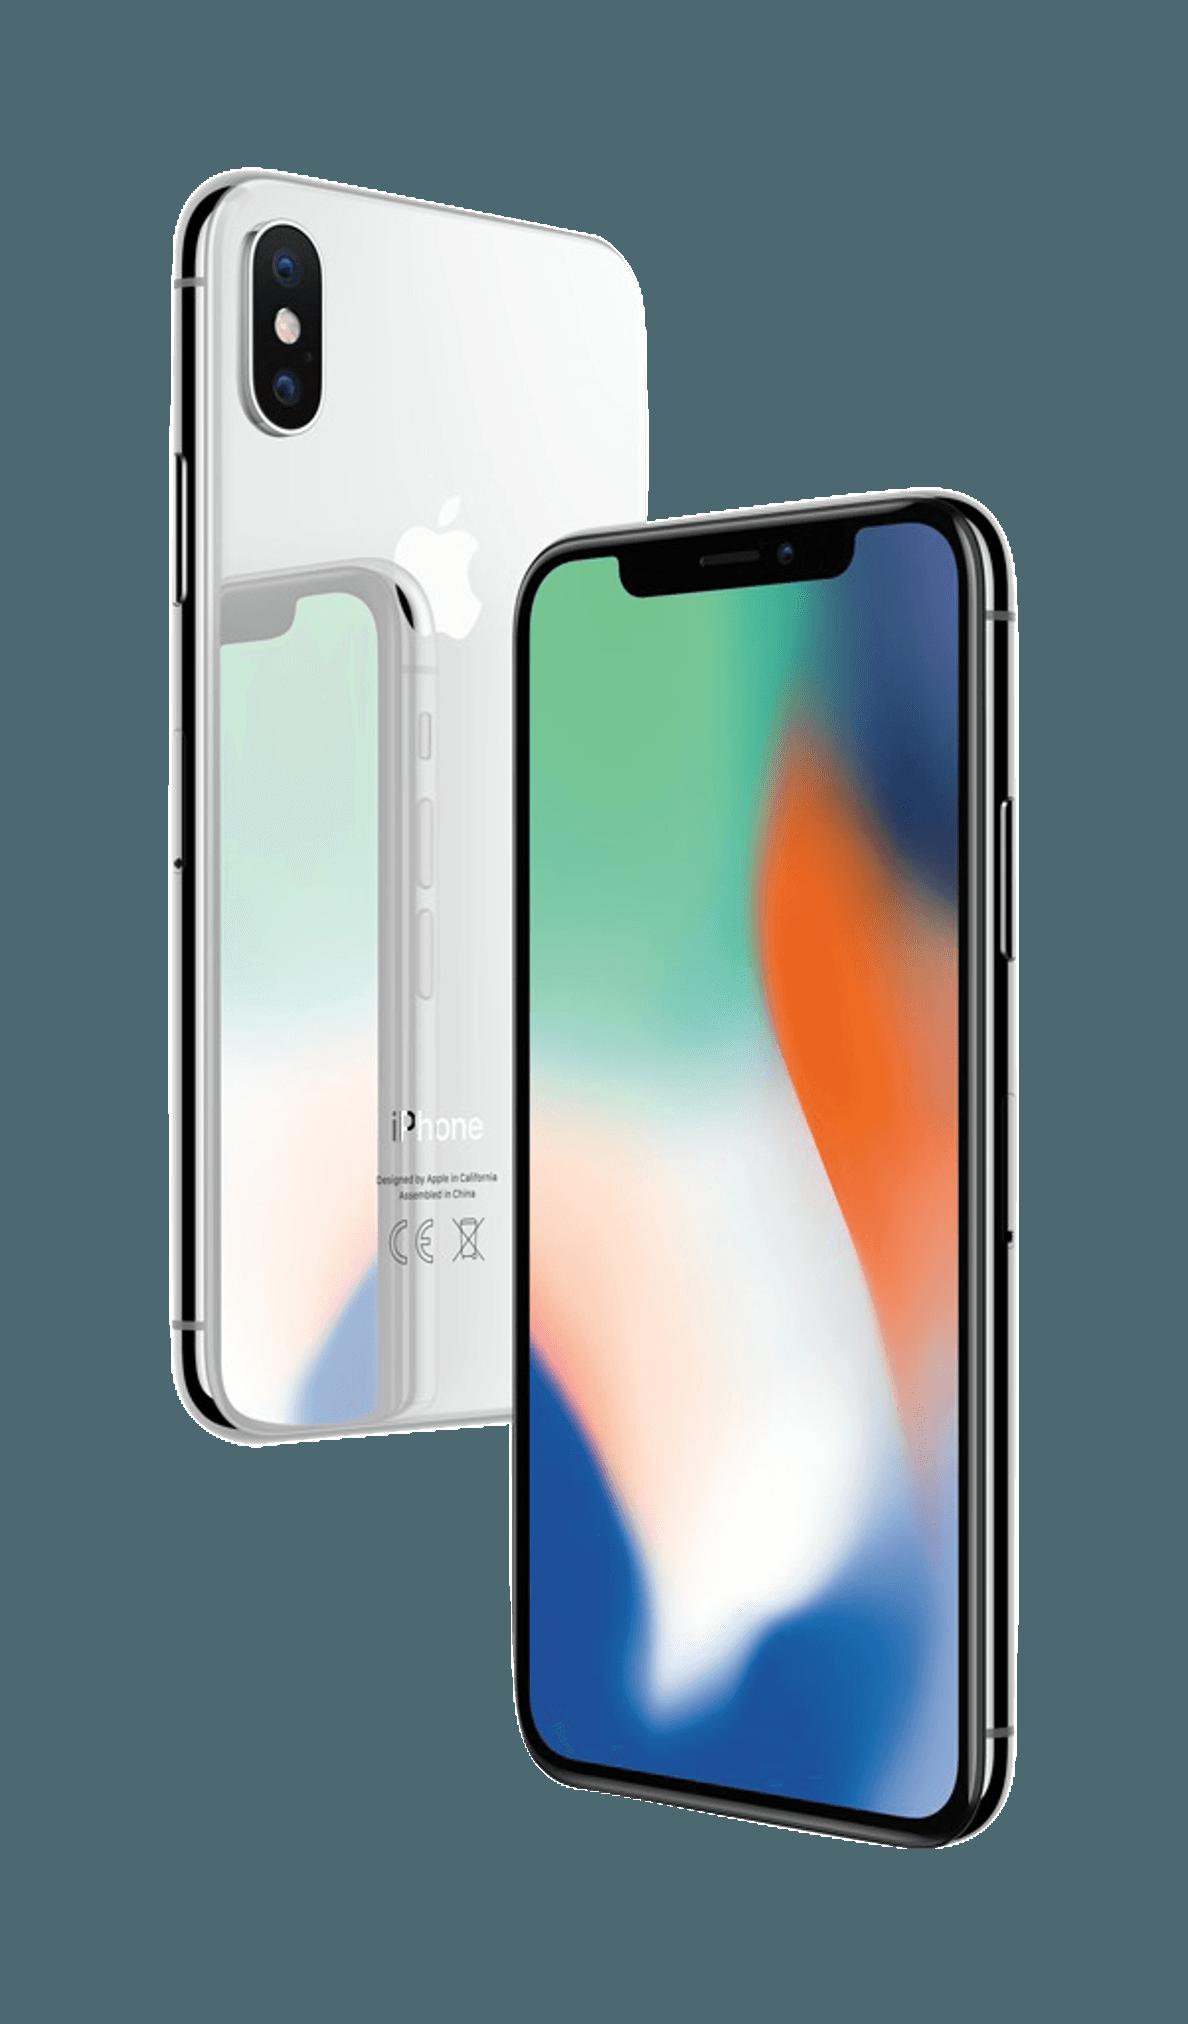 Apple Iphone X Smartphone 64 Gb Silber 00190198457639 Apple Iphone X Smartphone 64 Gb Silber Smartphones Tarifehandys Oh Apple Iphone Iphone Smartphone